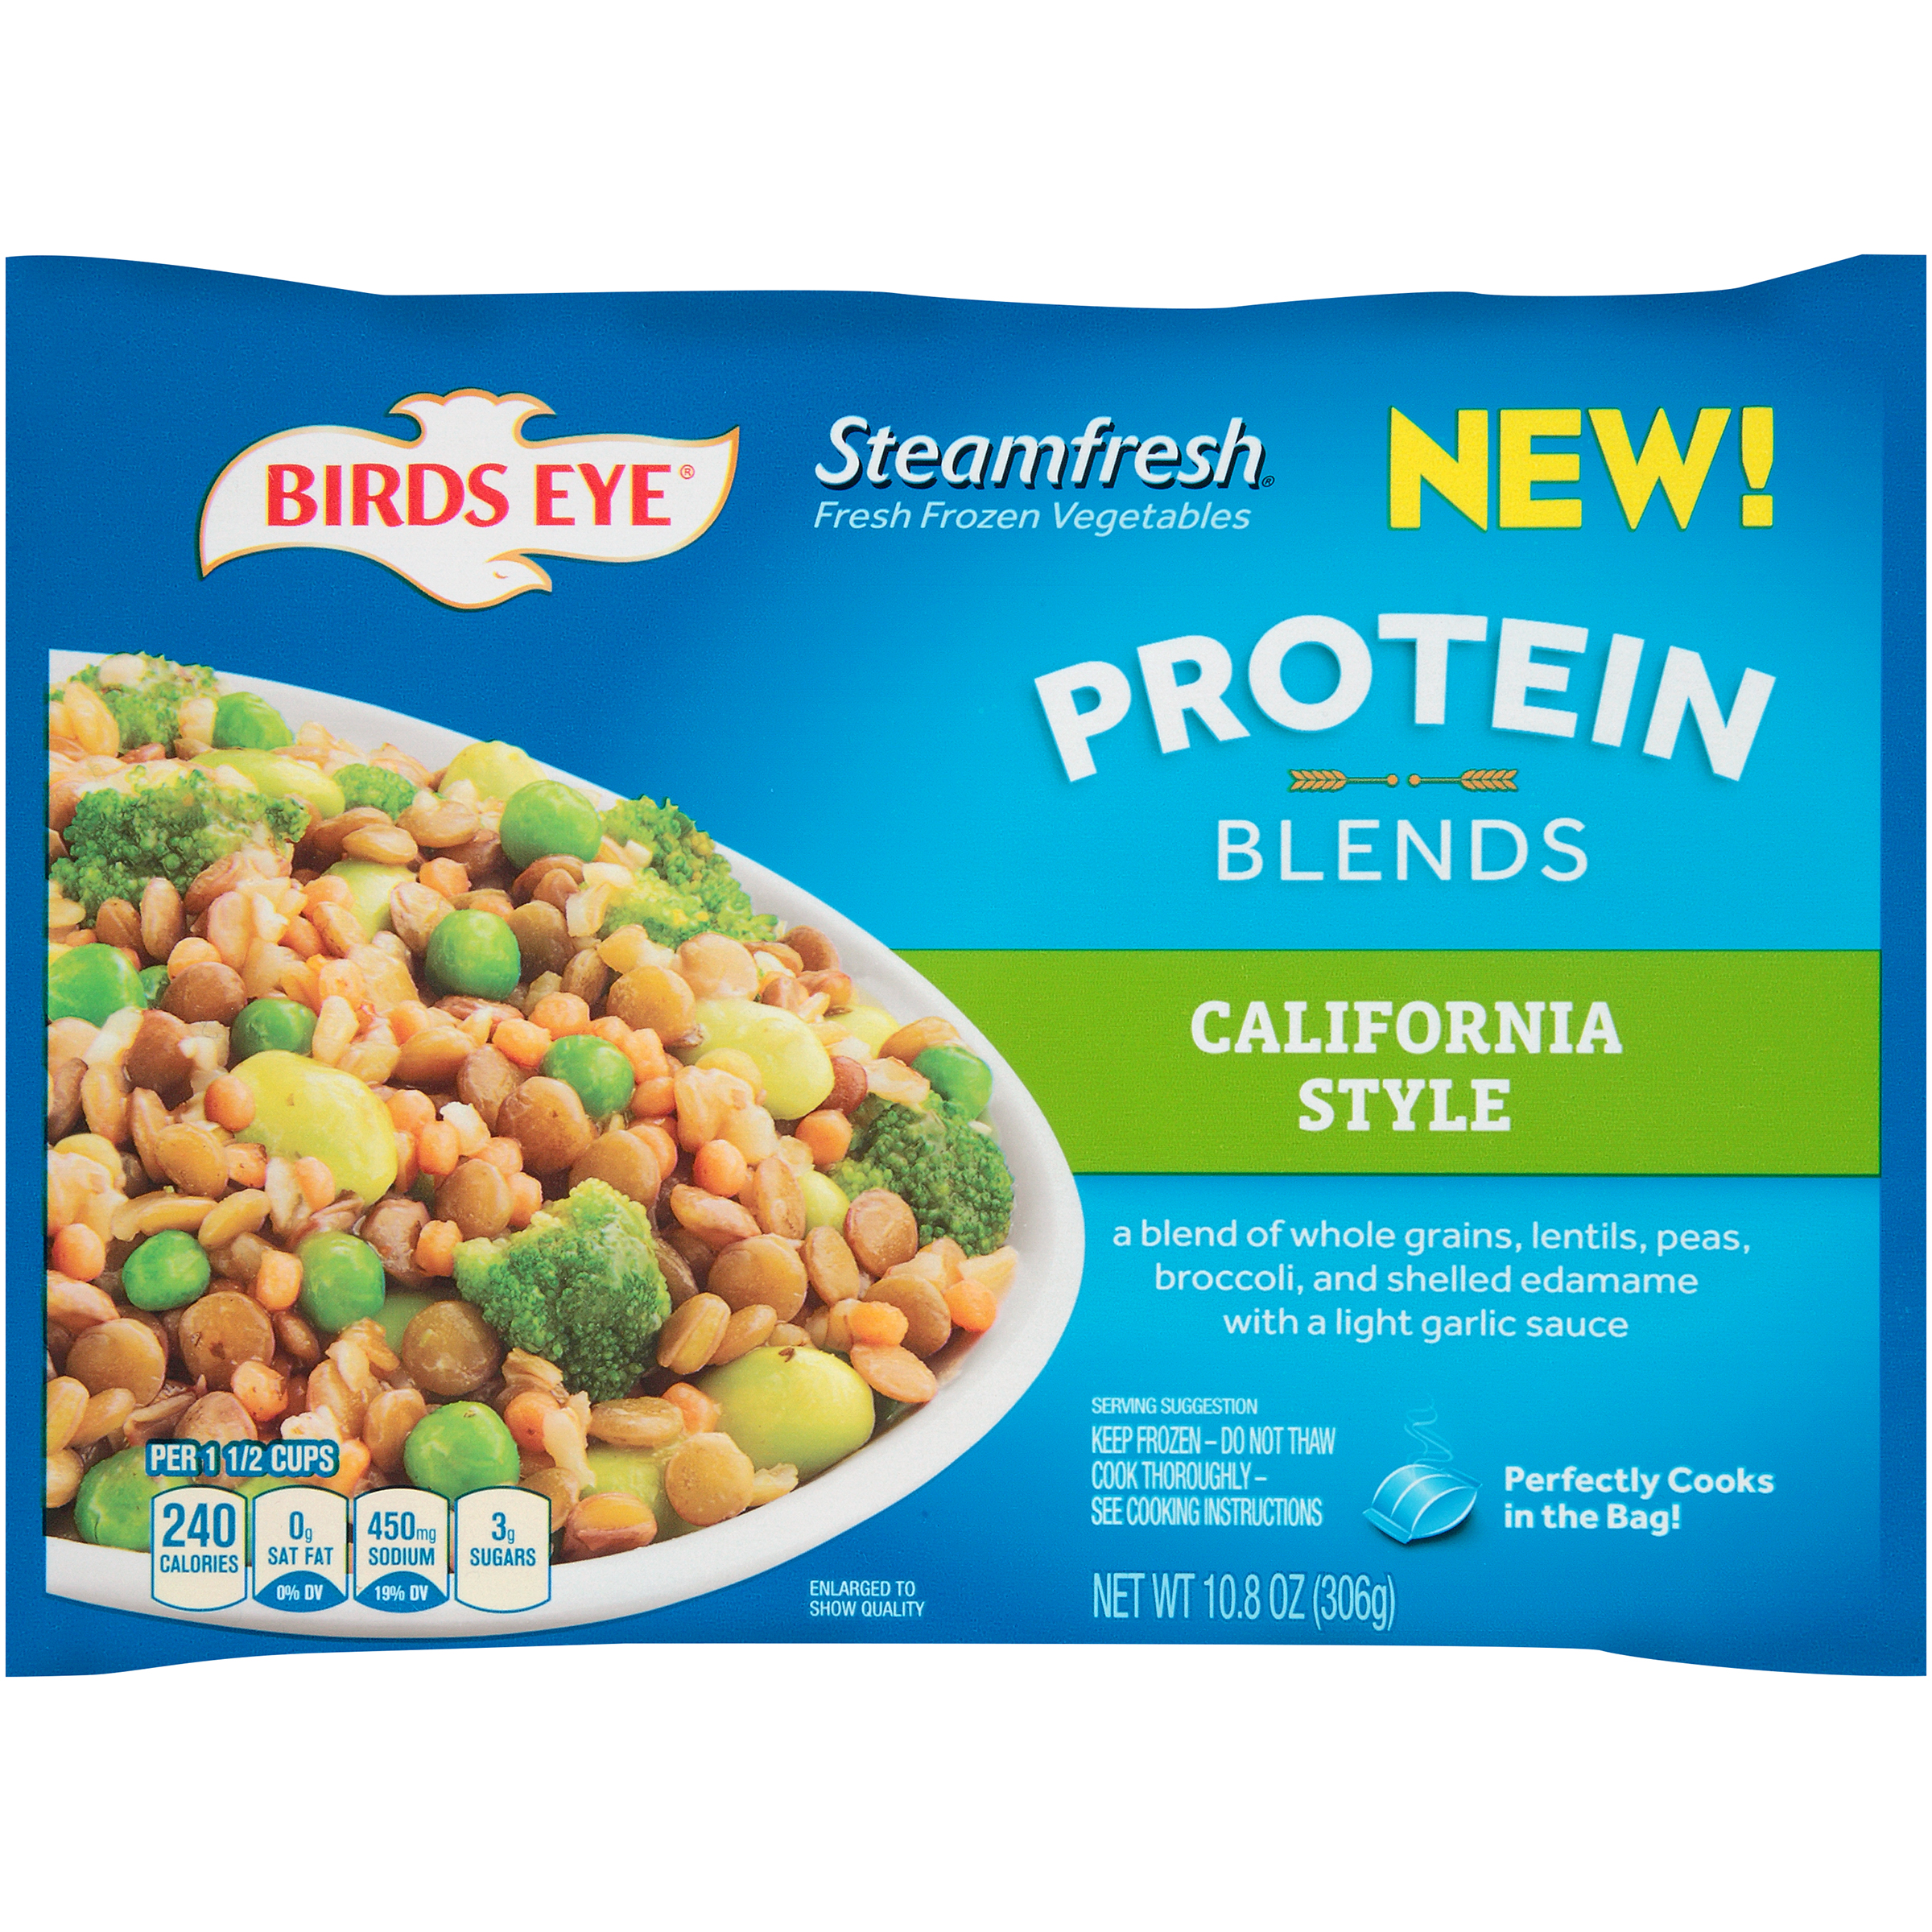 Birds Eye�� Steamfresh�� California Protein Blends 10.8 oz. Box